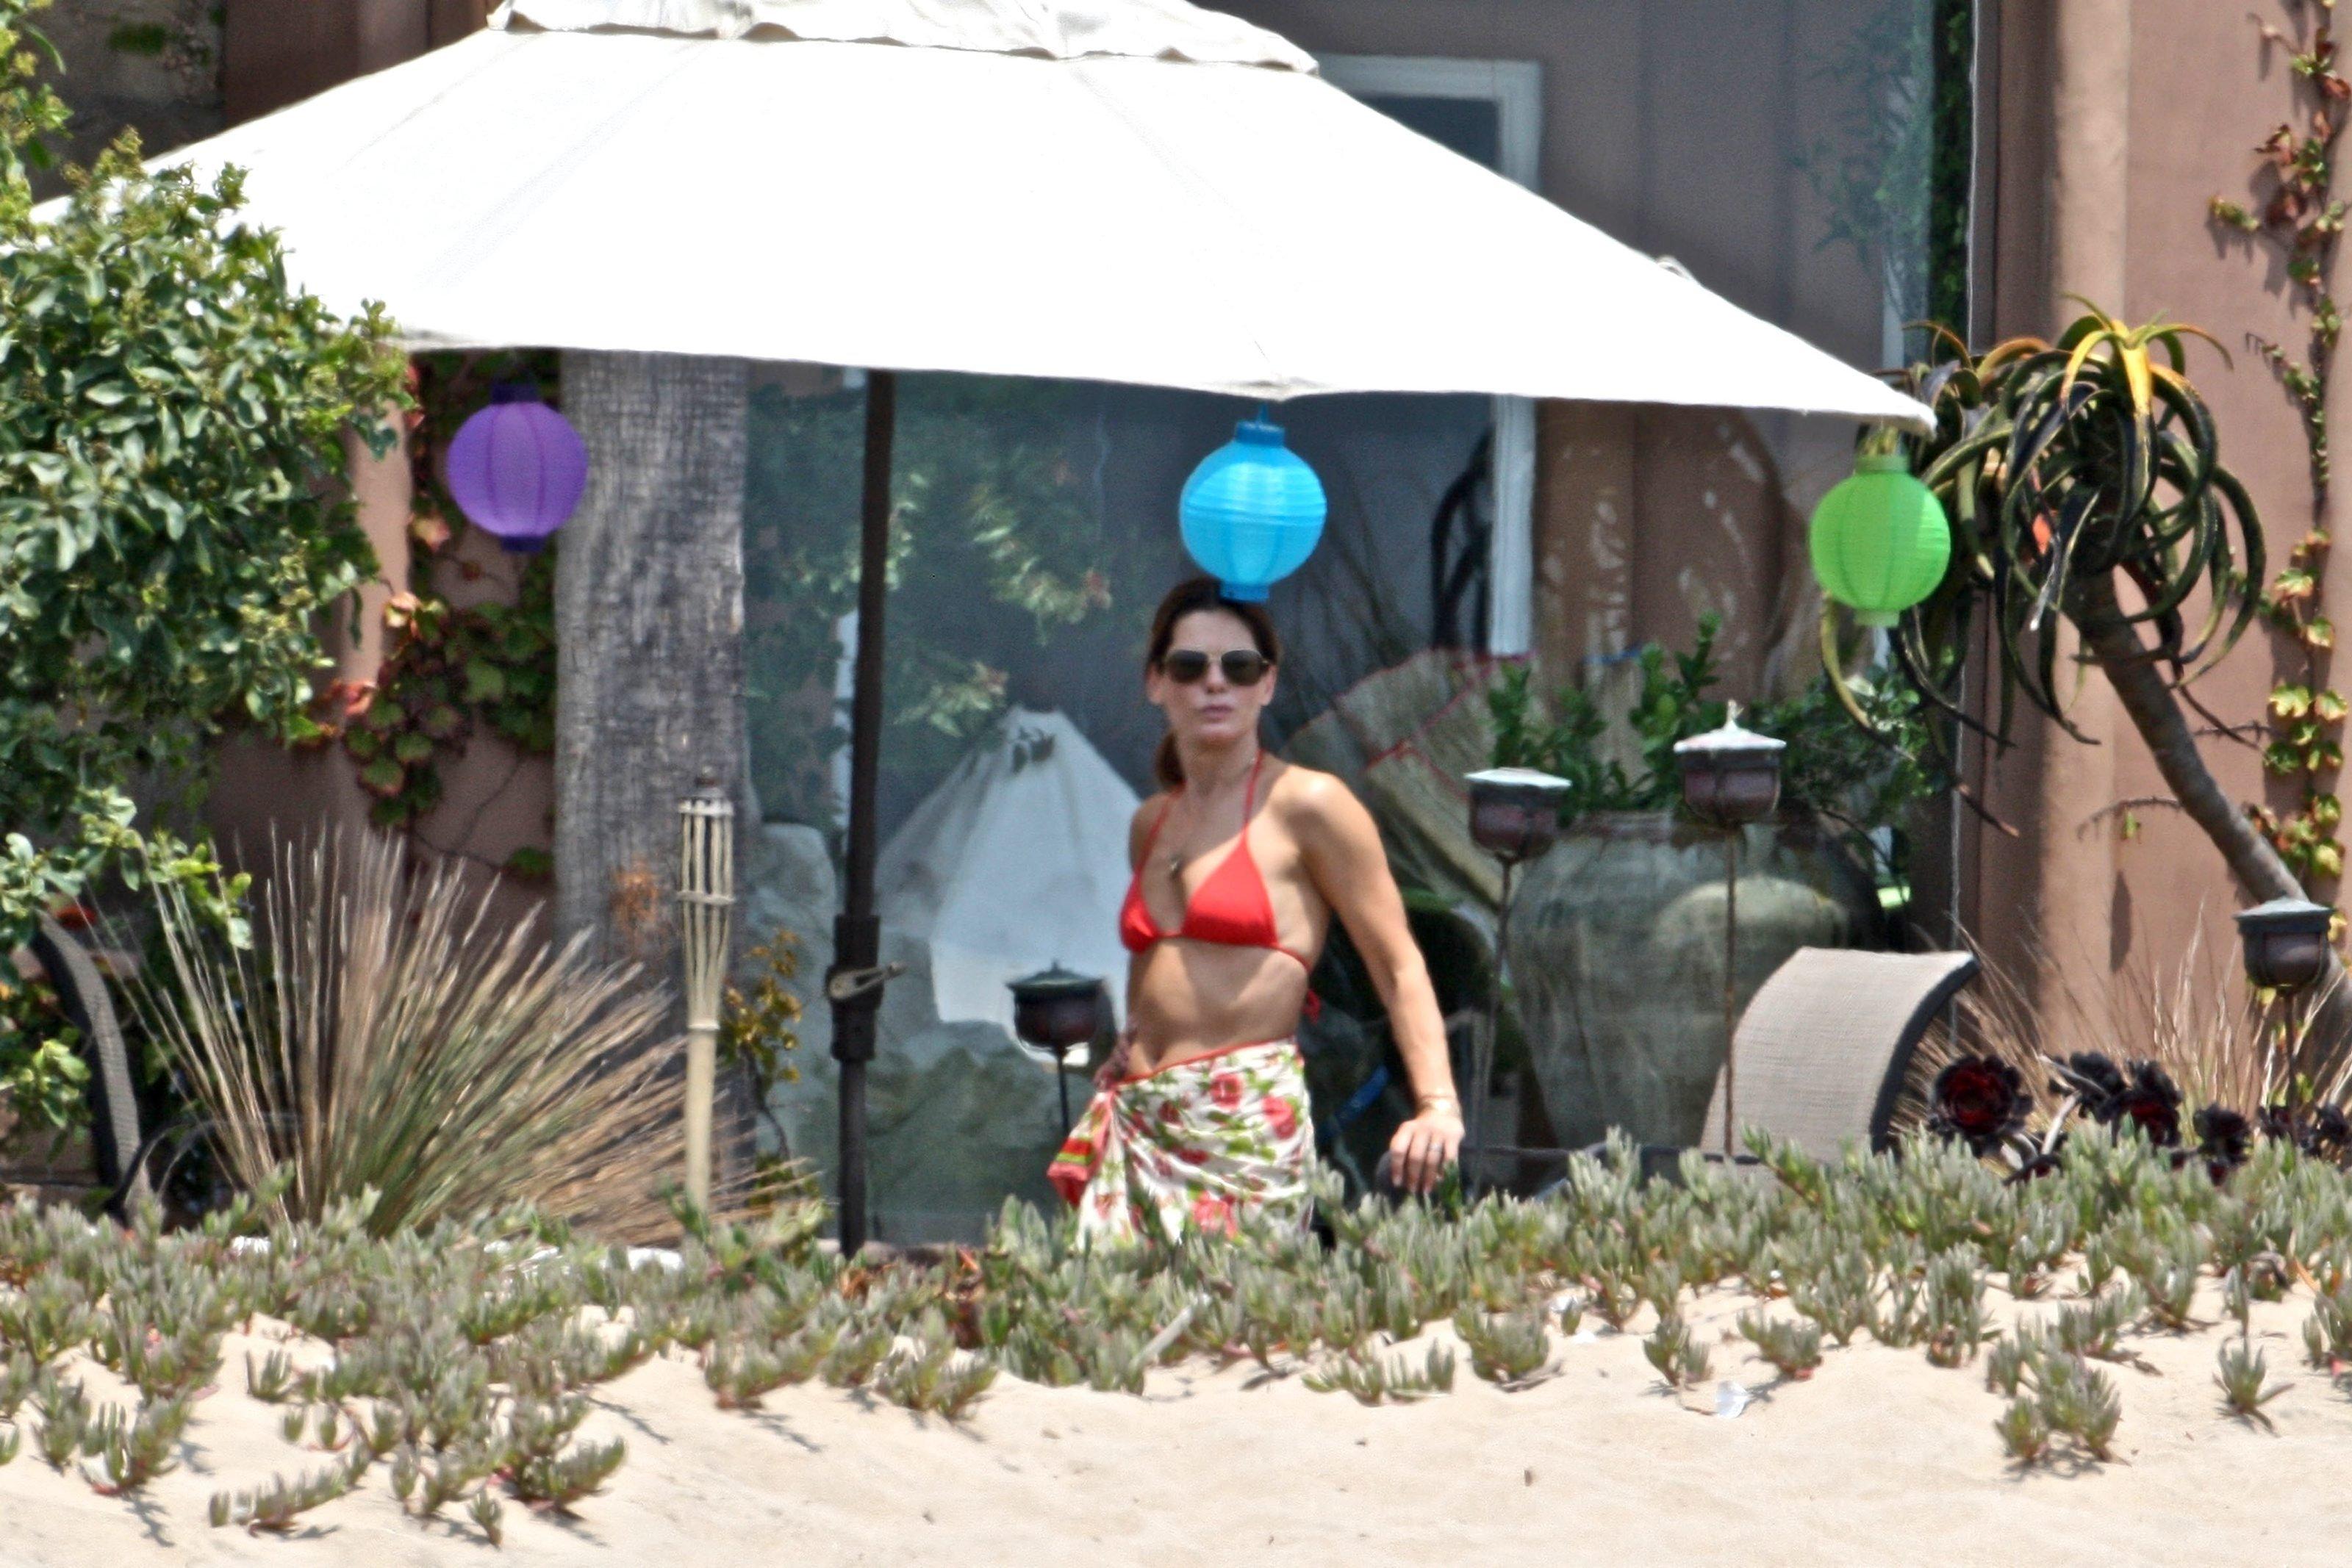 79735_Celebutopia-Sandra_Bullock_in_top_bikini_and_husband_host_an_Independence_Day_beach_party-13_122_1073lo.jpg